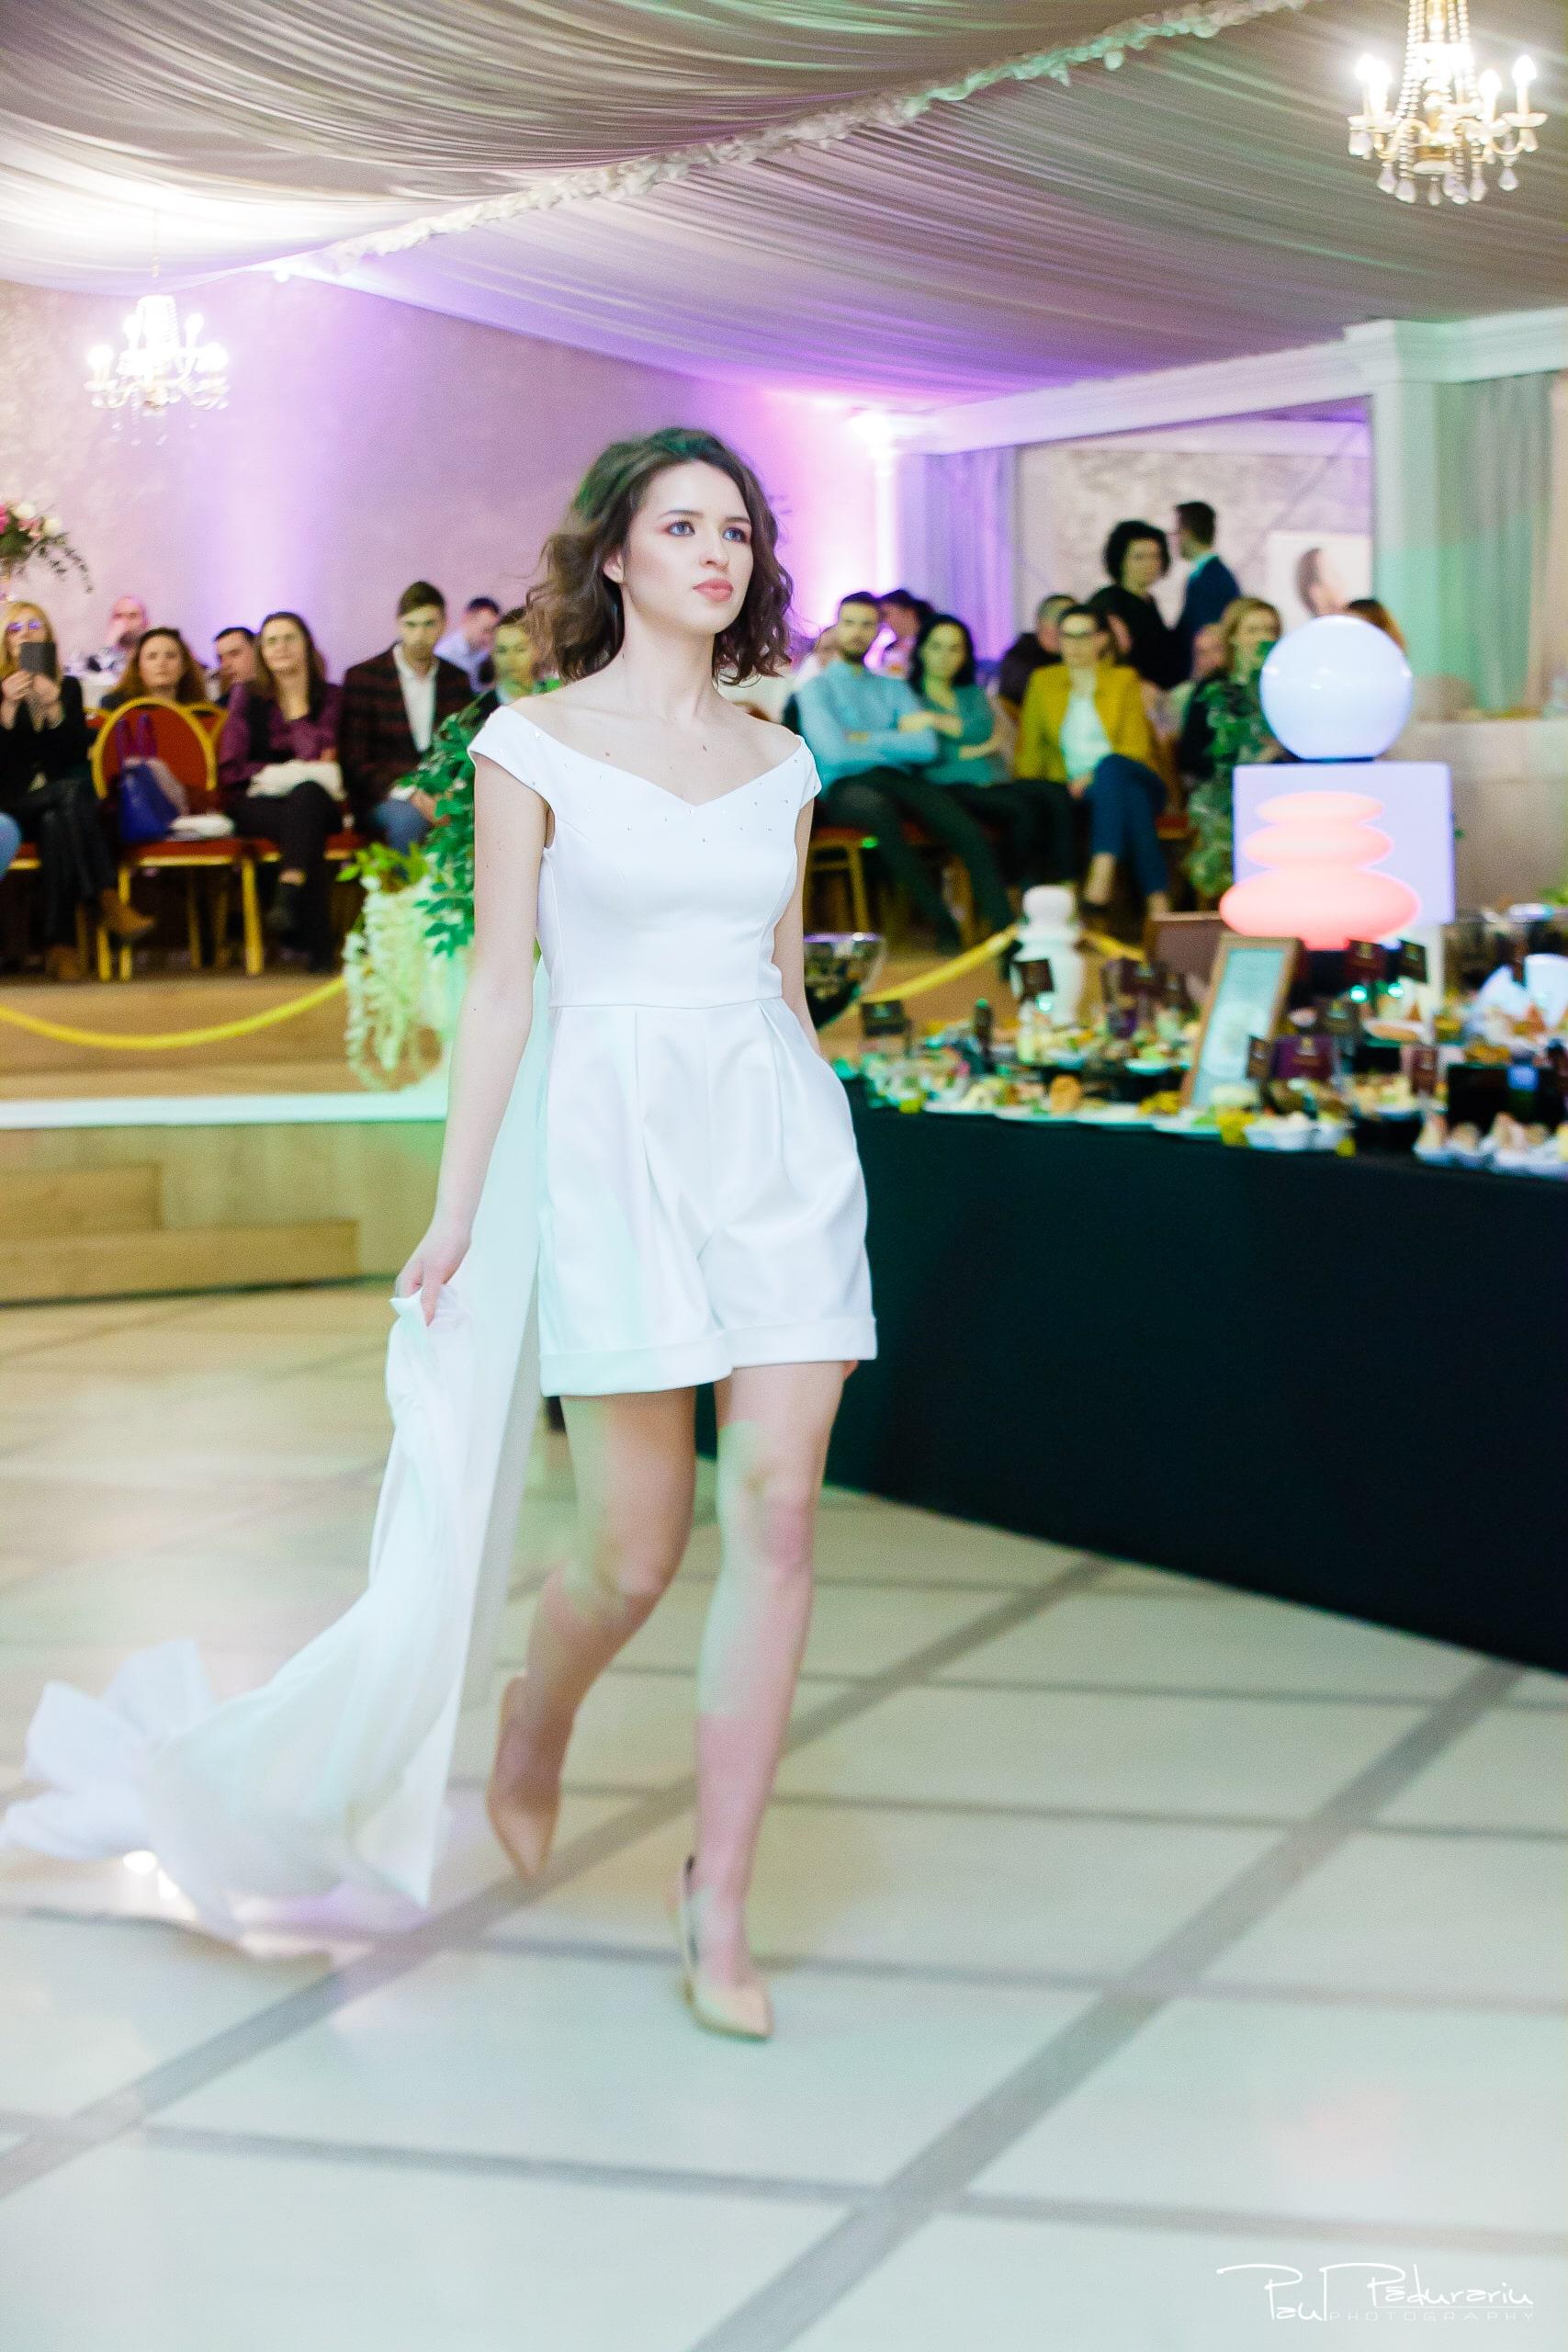 Modern Bride Edith Val colectie rochie mireasa 2019 - fotograf profesionist iasi paul padurariu | nunta iasi 2